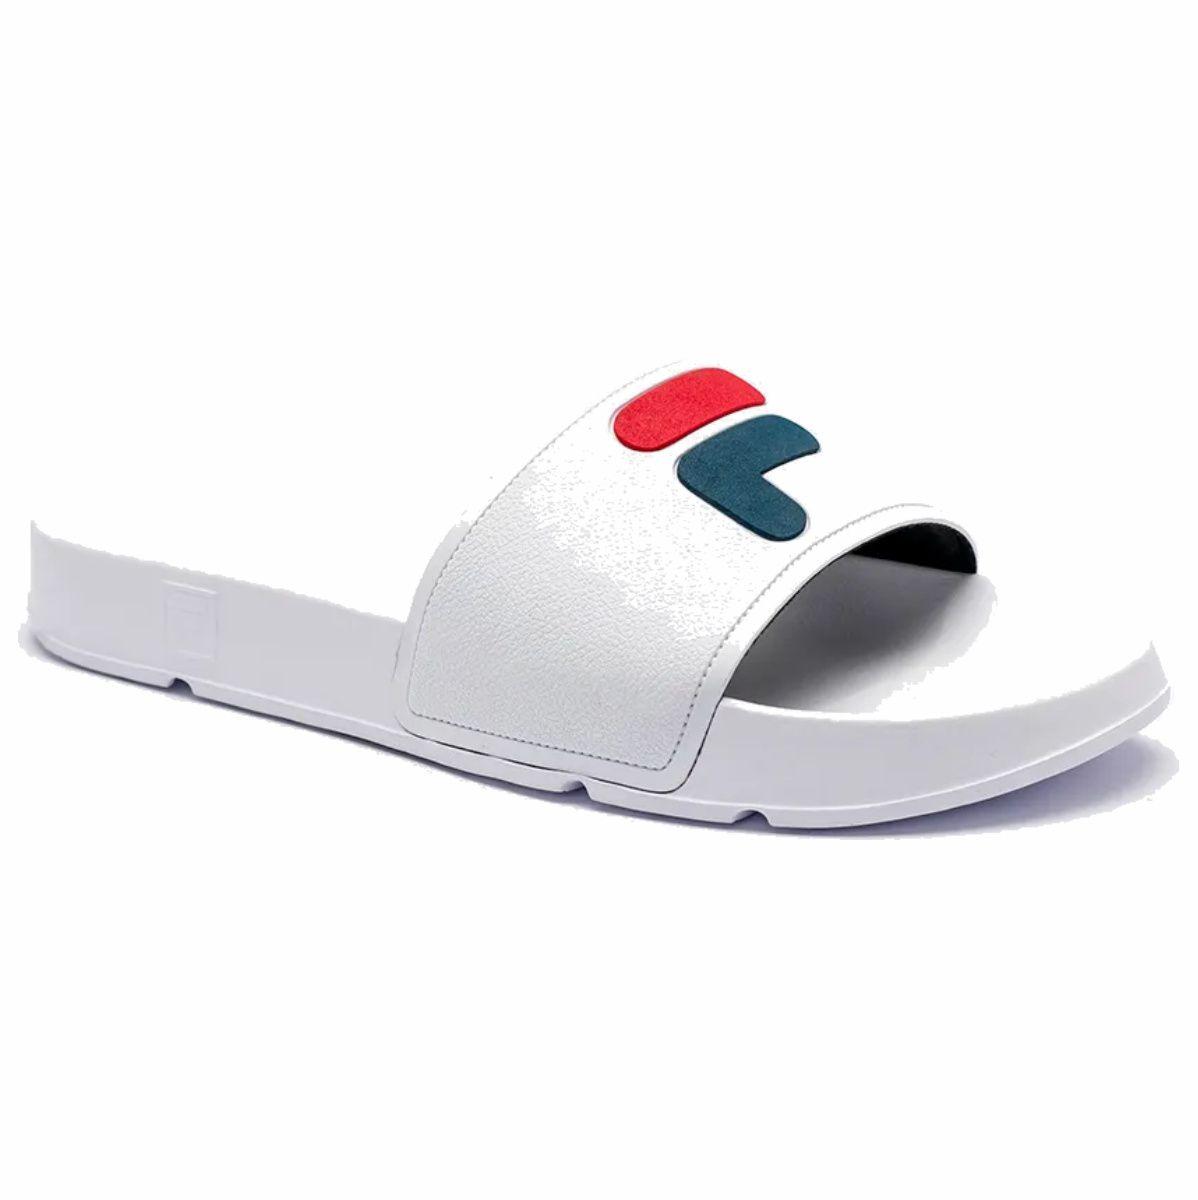 Chinelo Fila F-Slider 2.0 Flip Flop Fila F